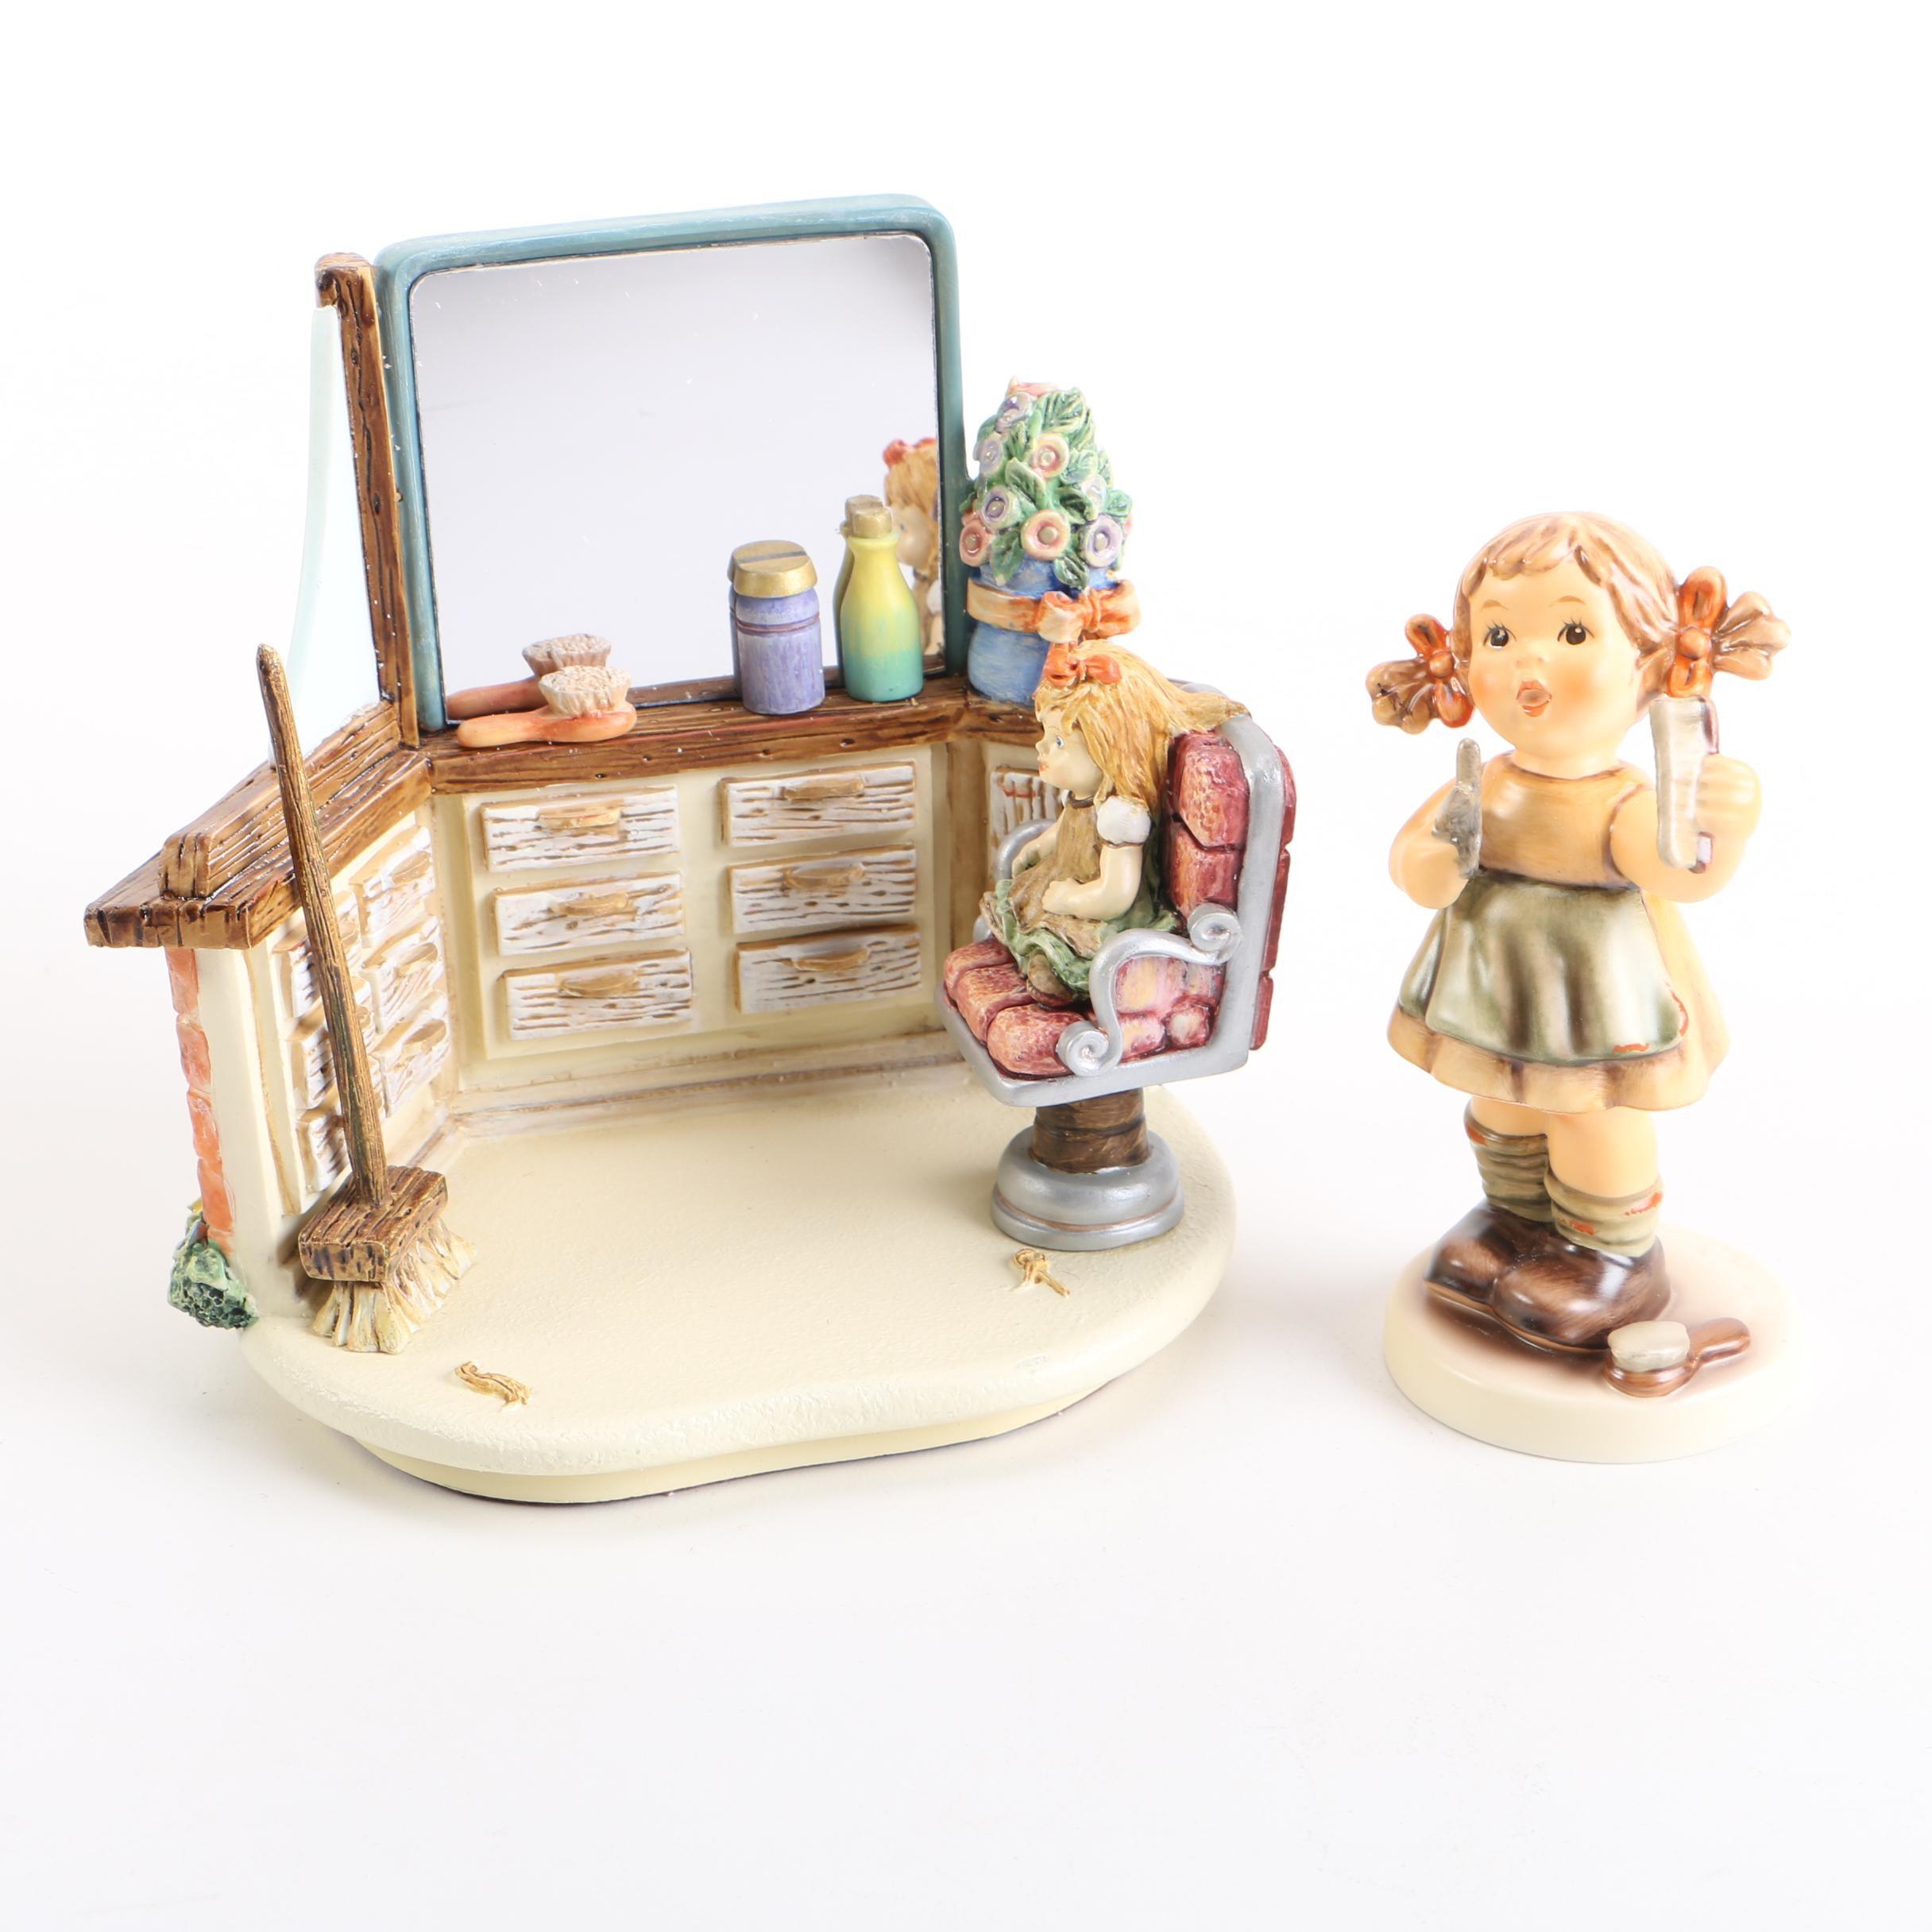 Hummel Accents Gift Box Set